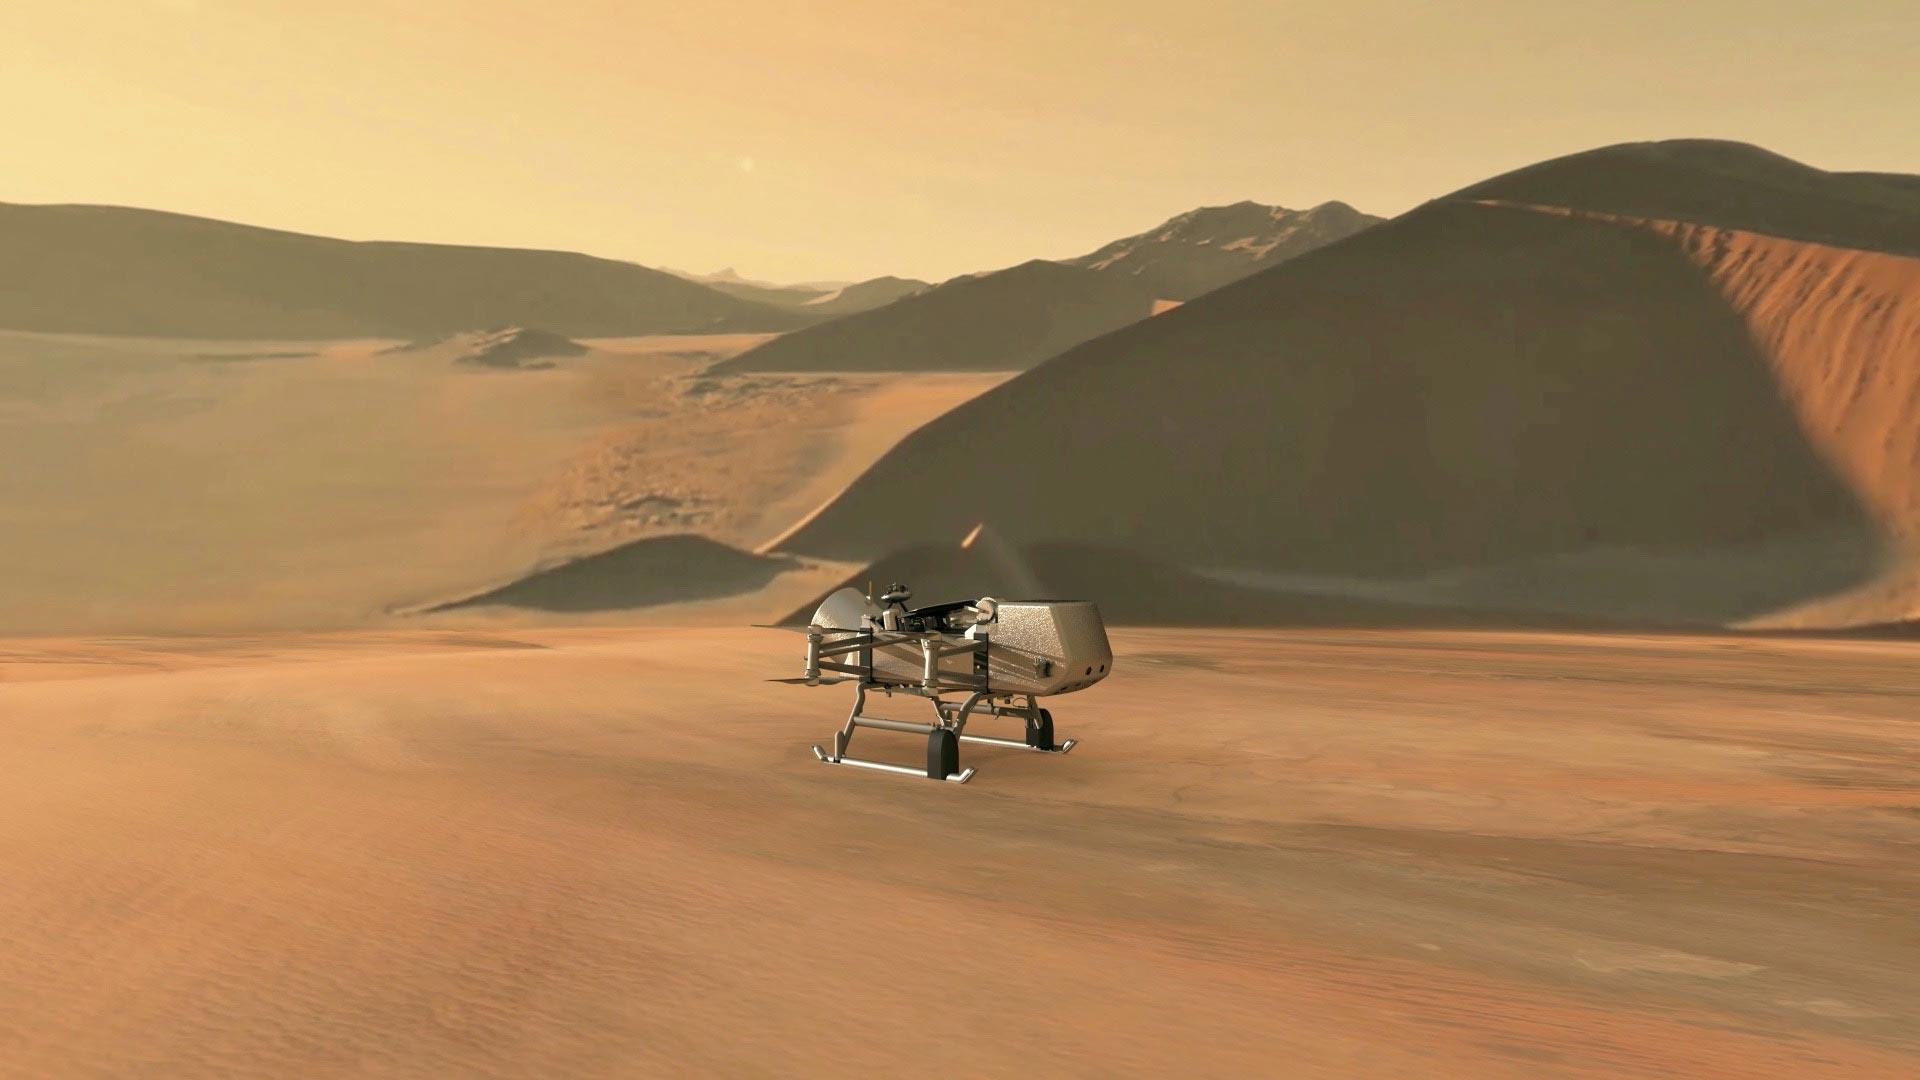 NASA Dragonfly Rotorcraft Lander